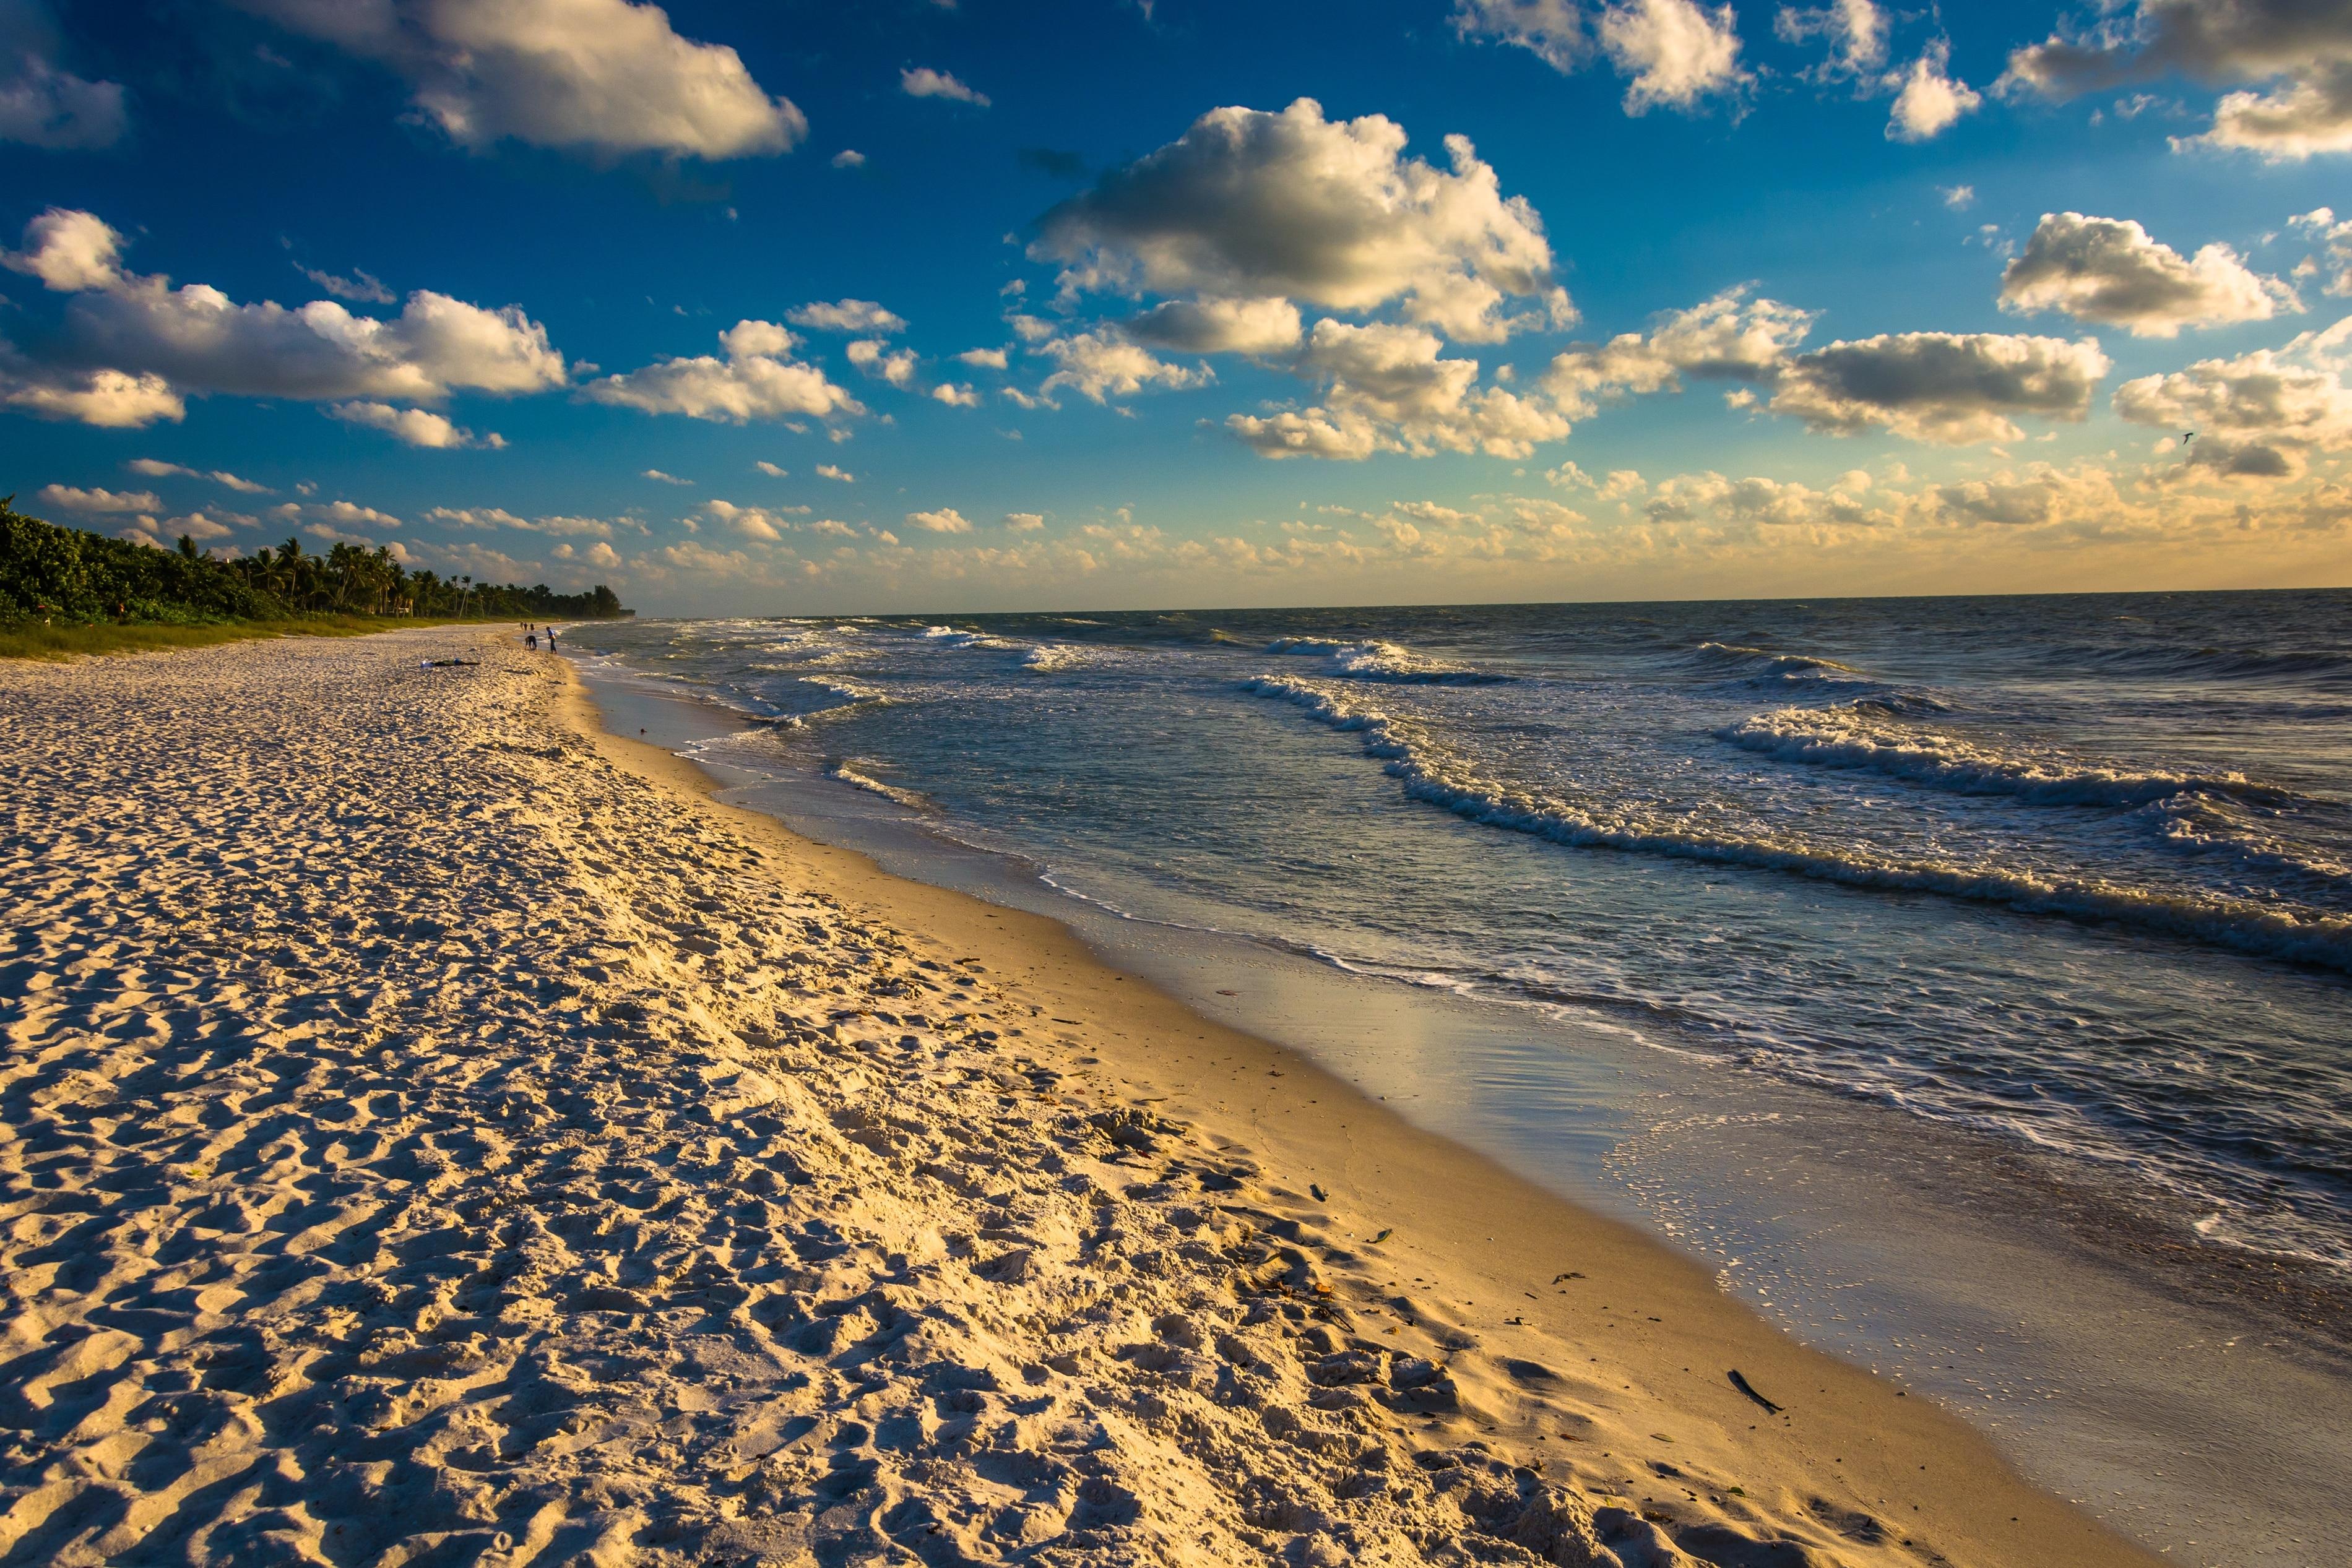 Park Shore, Florida, United States of America